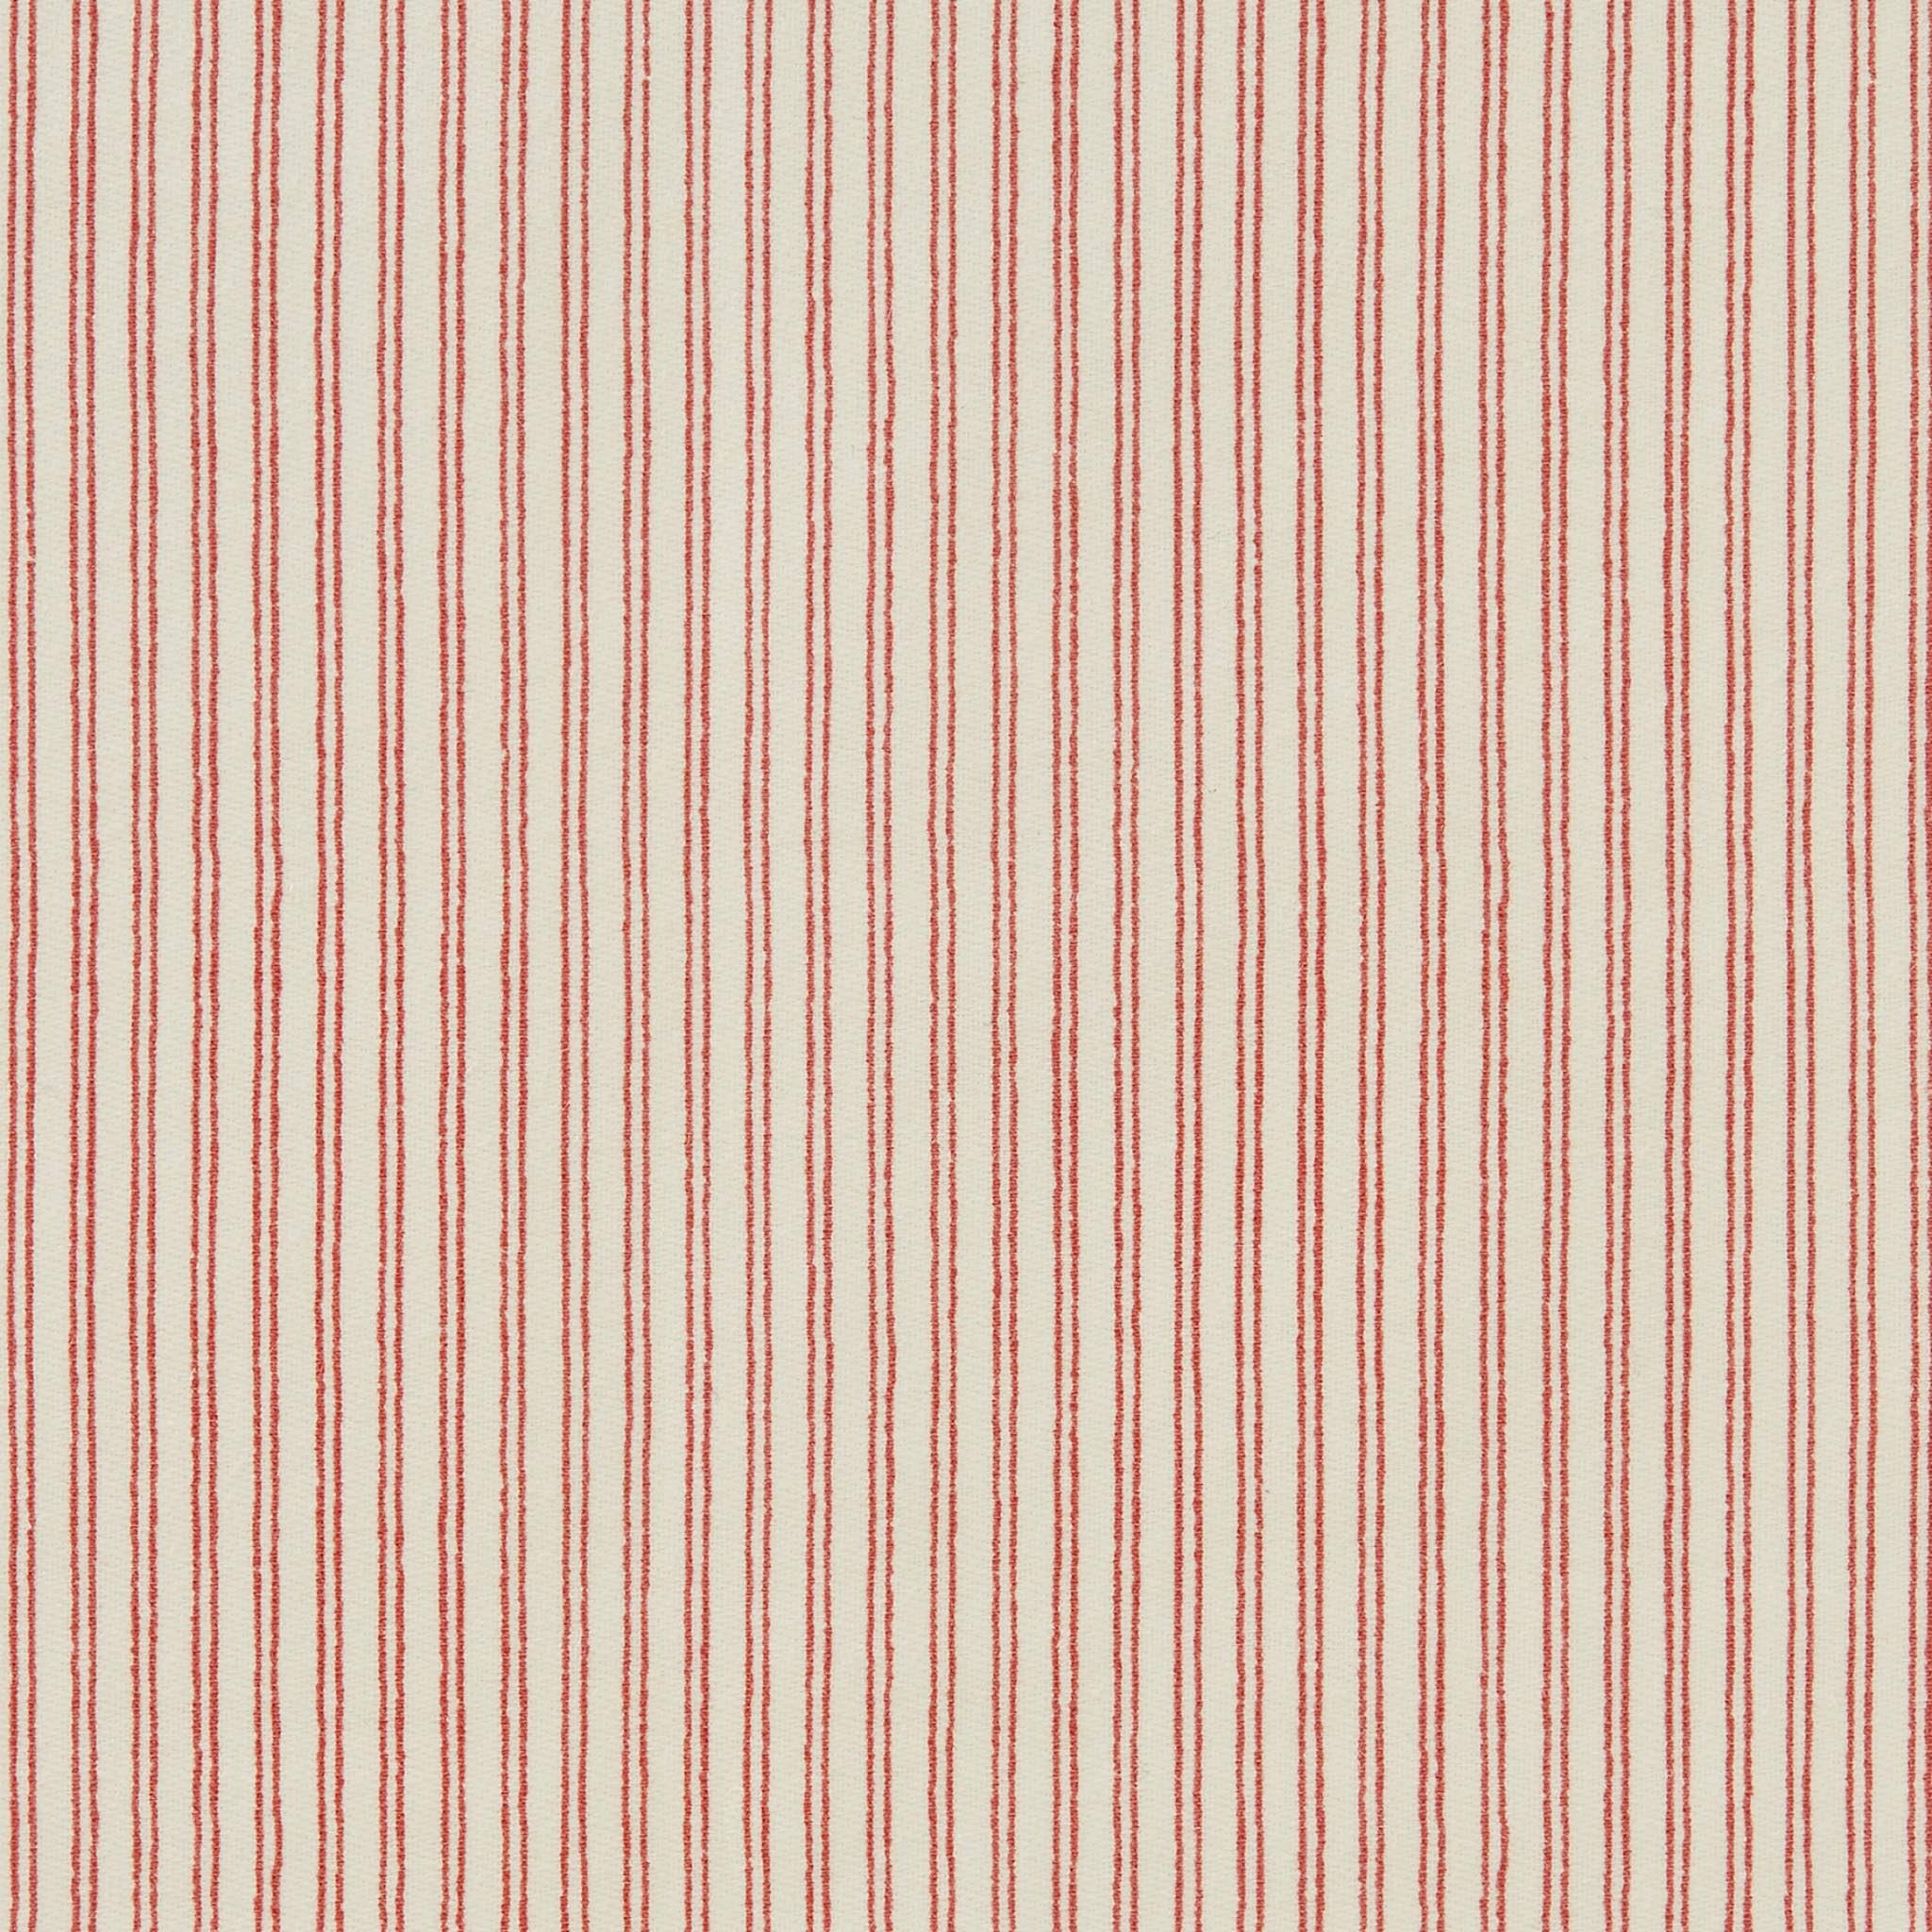 N&Y_Small Prints_Plough Stripe_Red_Swatch_1x1.jpg